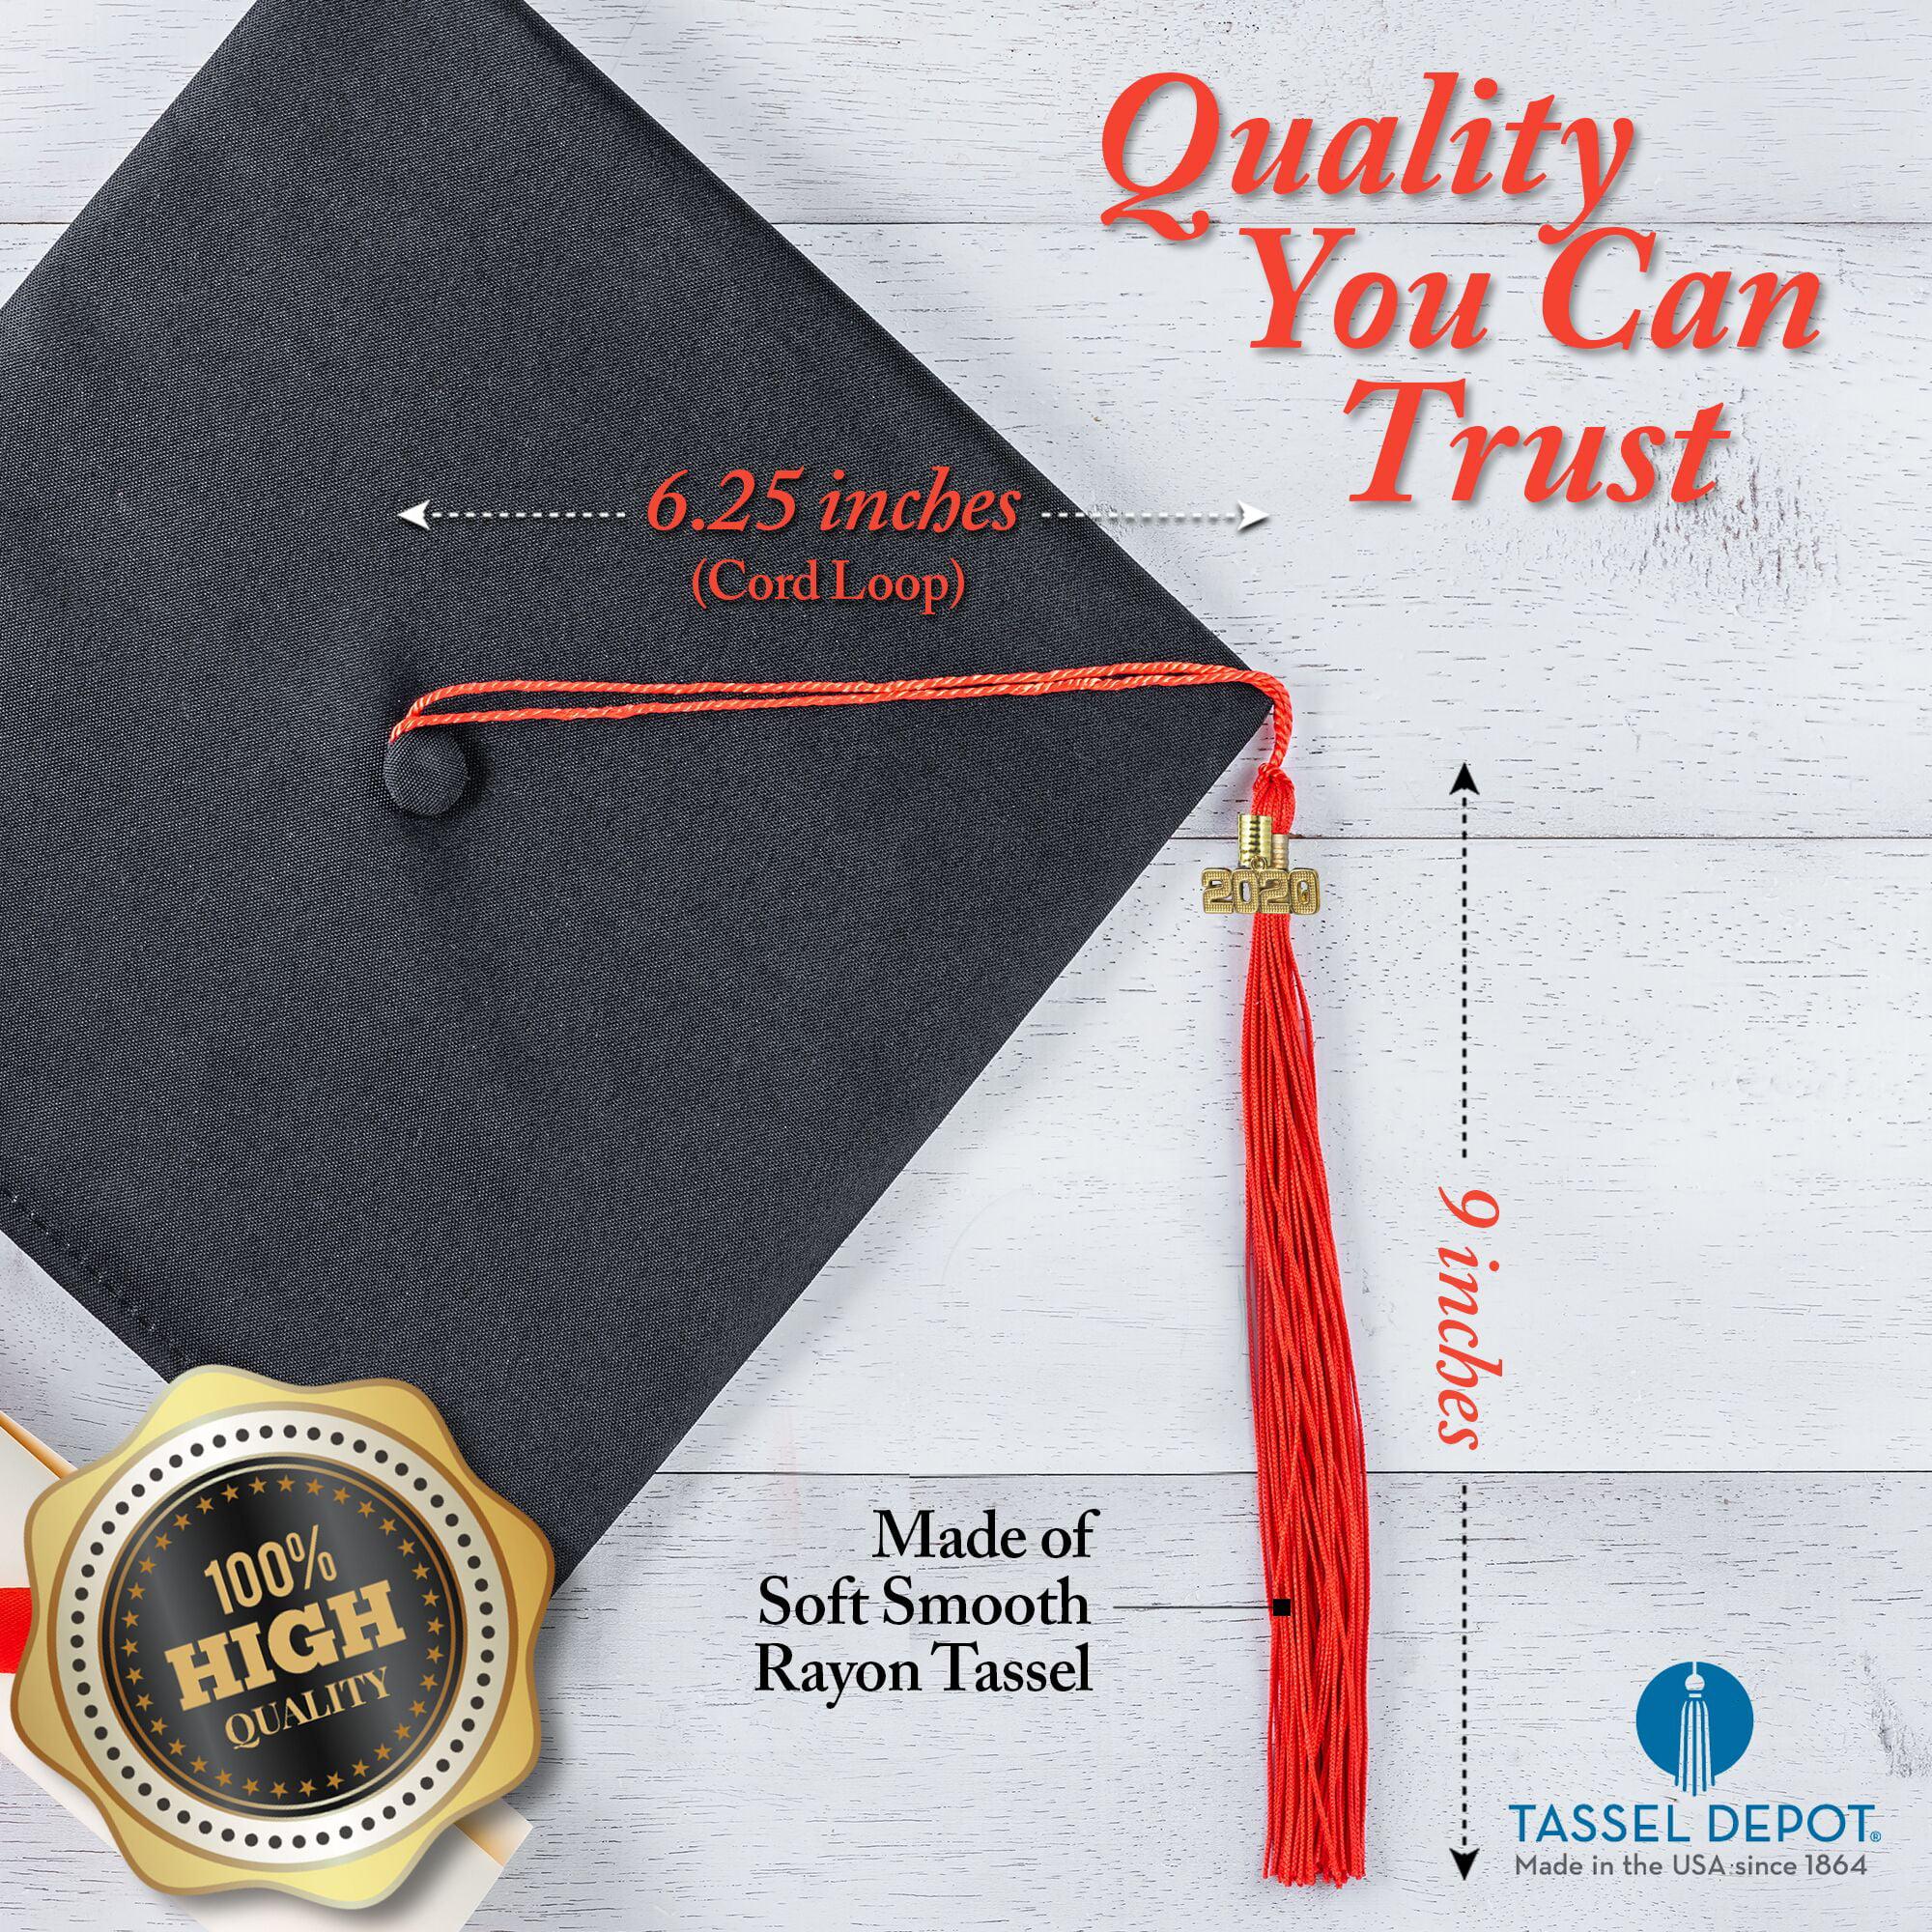 MAQUE 2020 Graduation Tassel Handmade Silk Graduation Tassel with 2020 Year Charm Grad Days for Unisex Graduates Academic Graduation Tassel 9 Graduation Cap Tassel